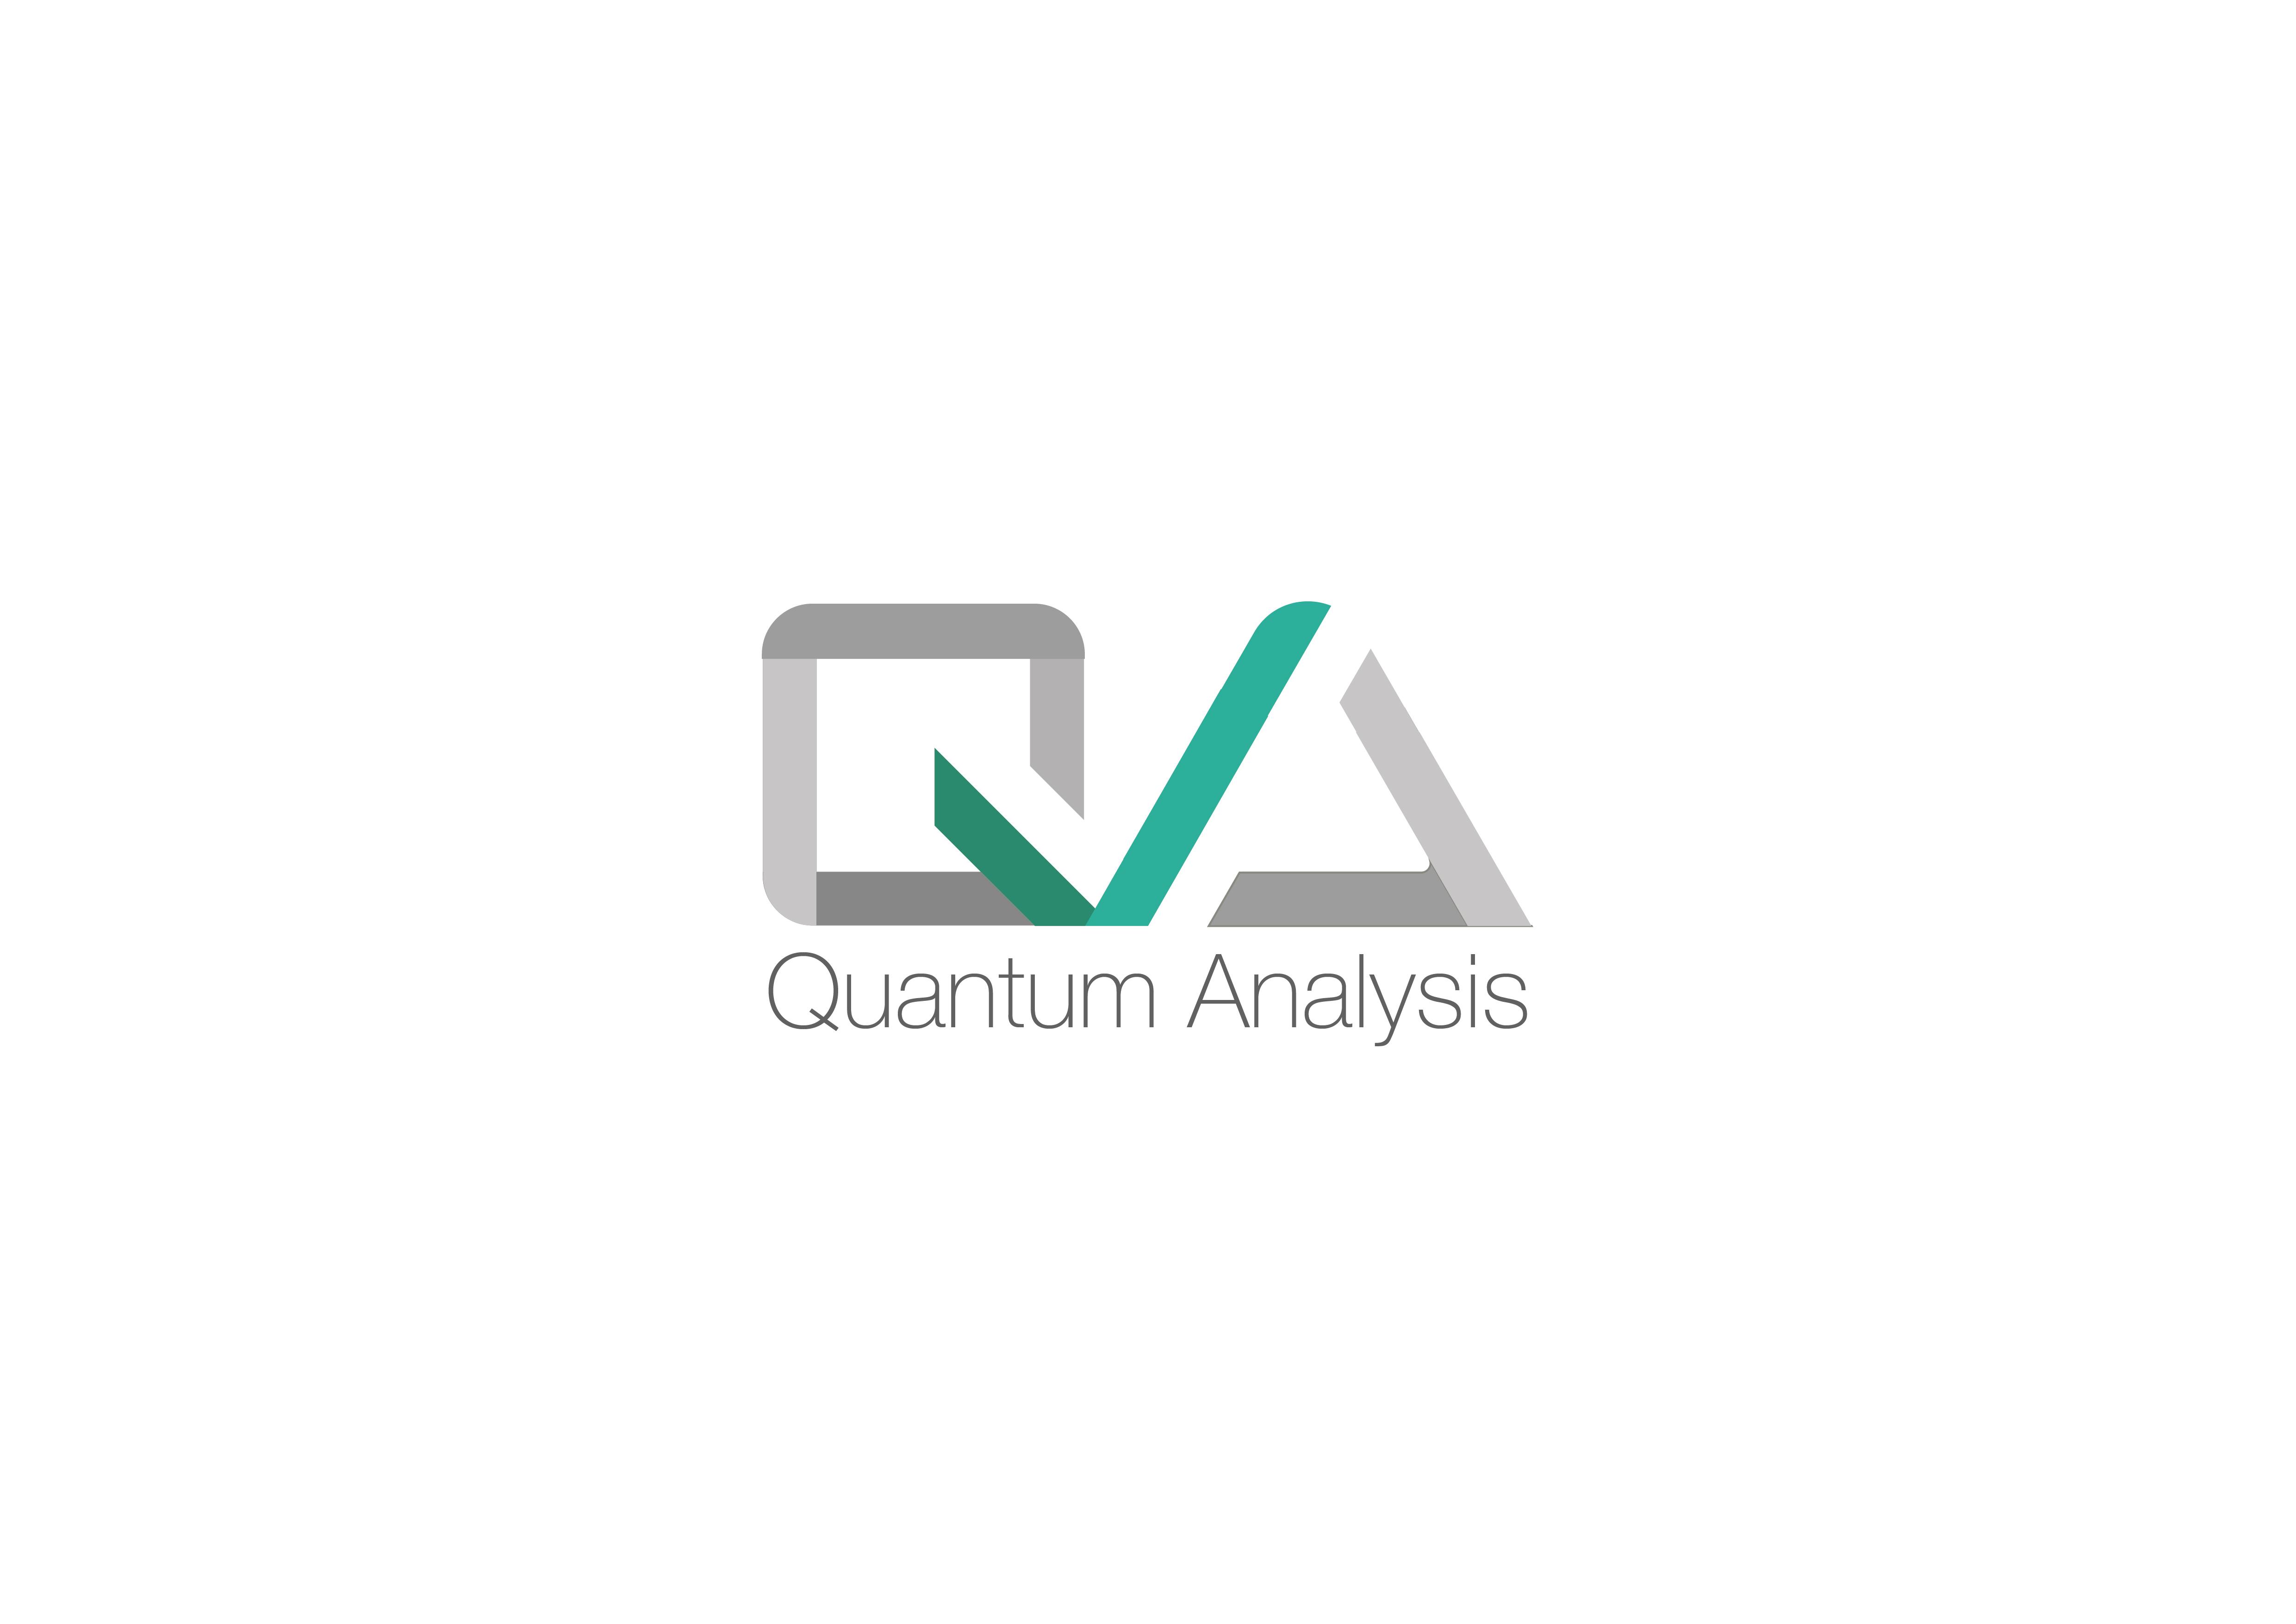 Quantum Analysis Logo Chris casey